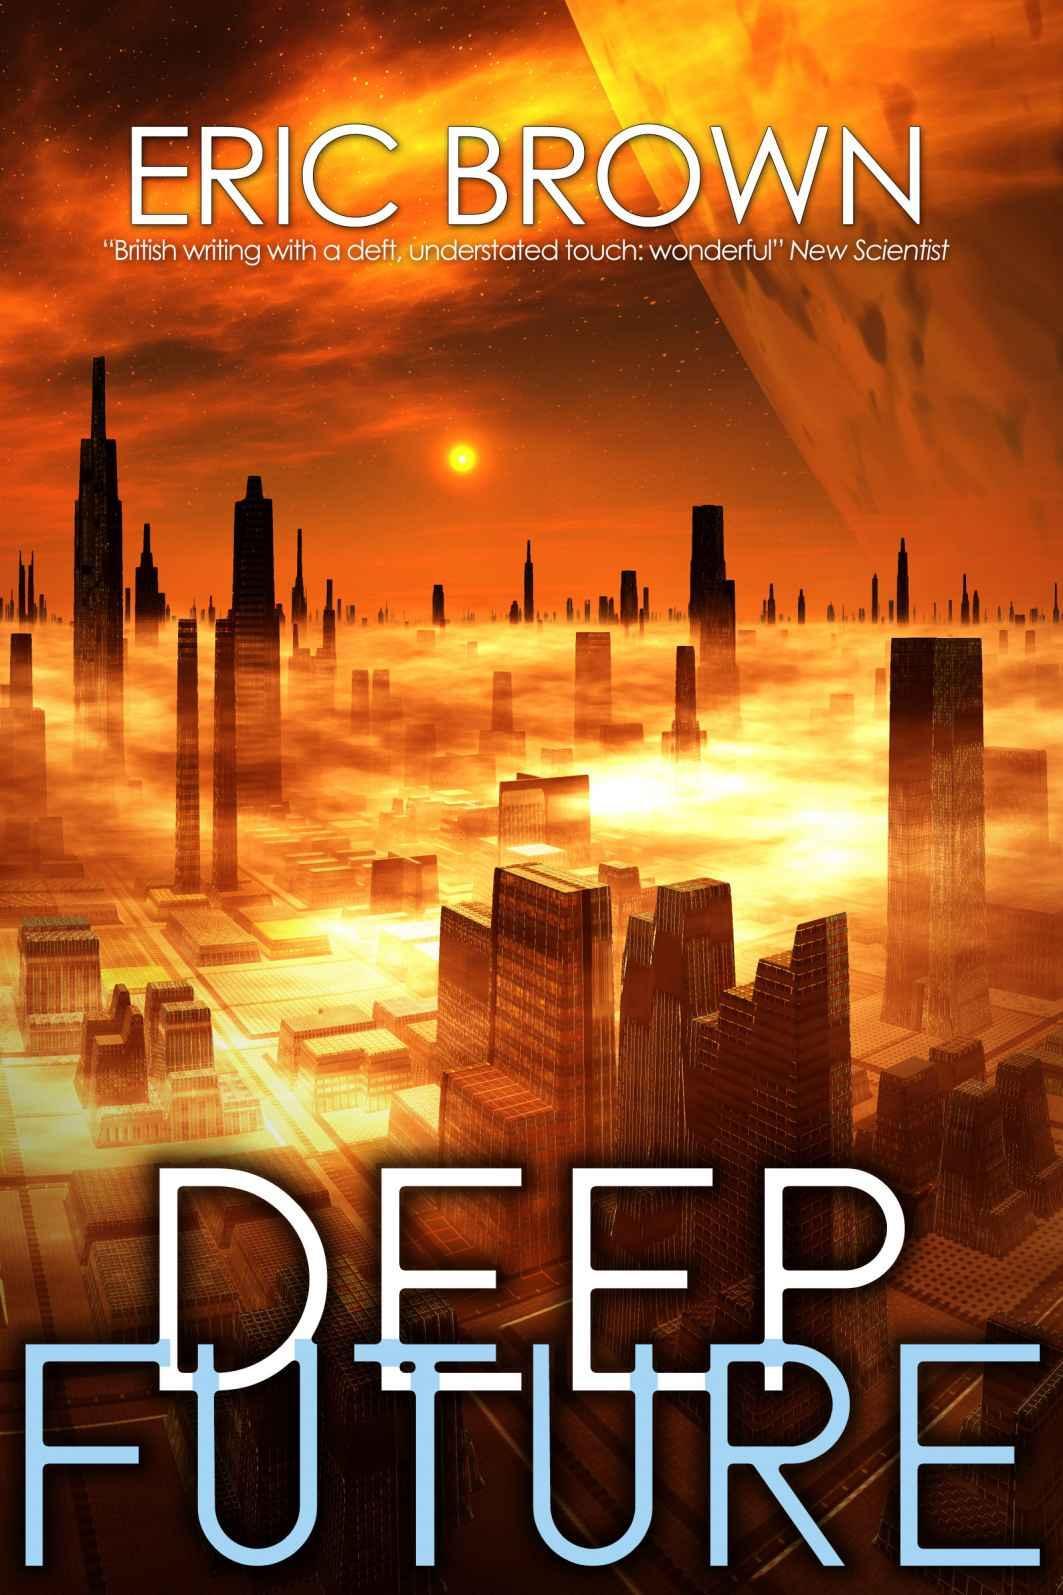 Deep Future